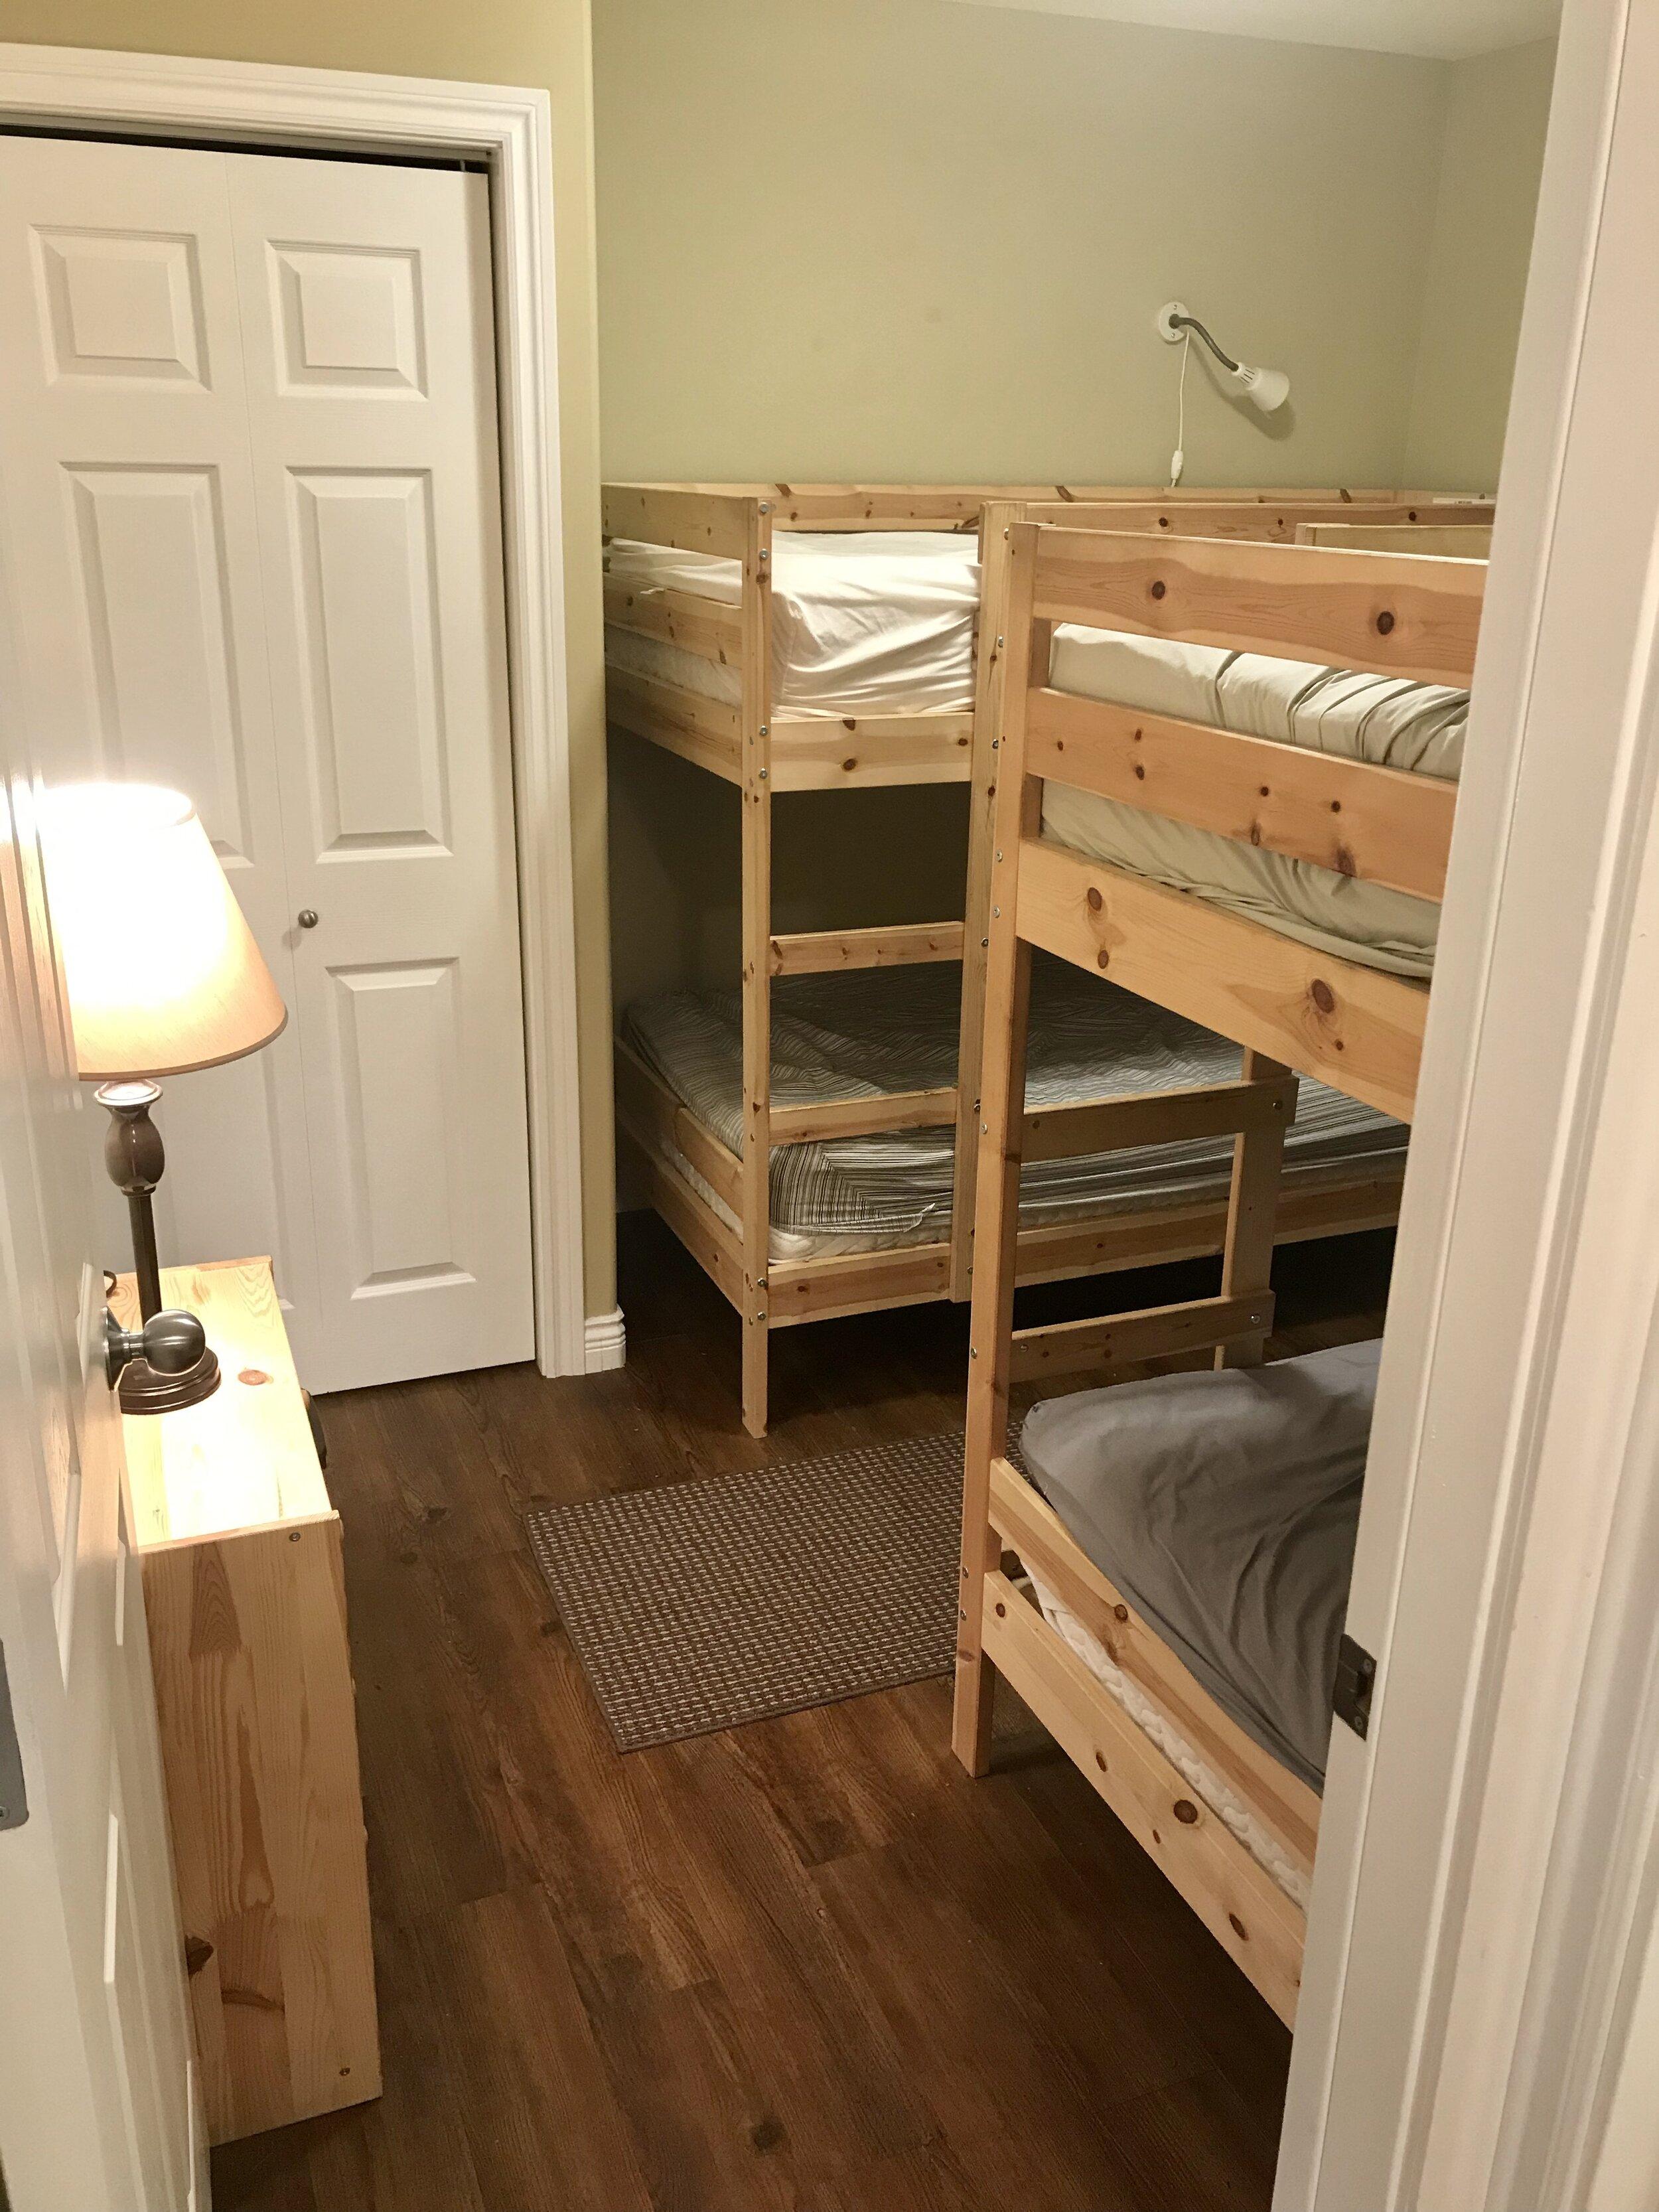 Mackenzie - Bedroom (4 singles)